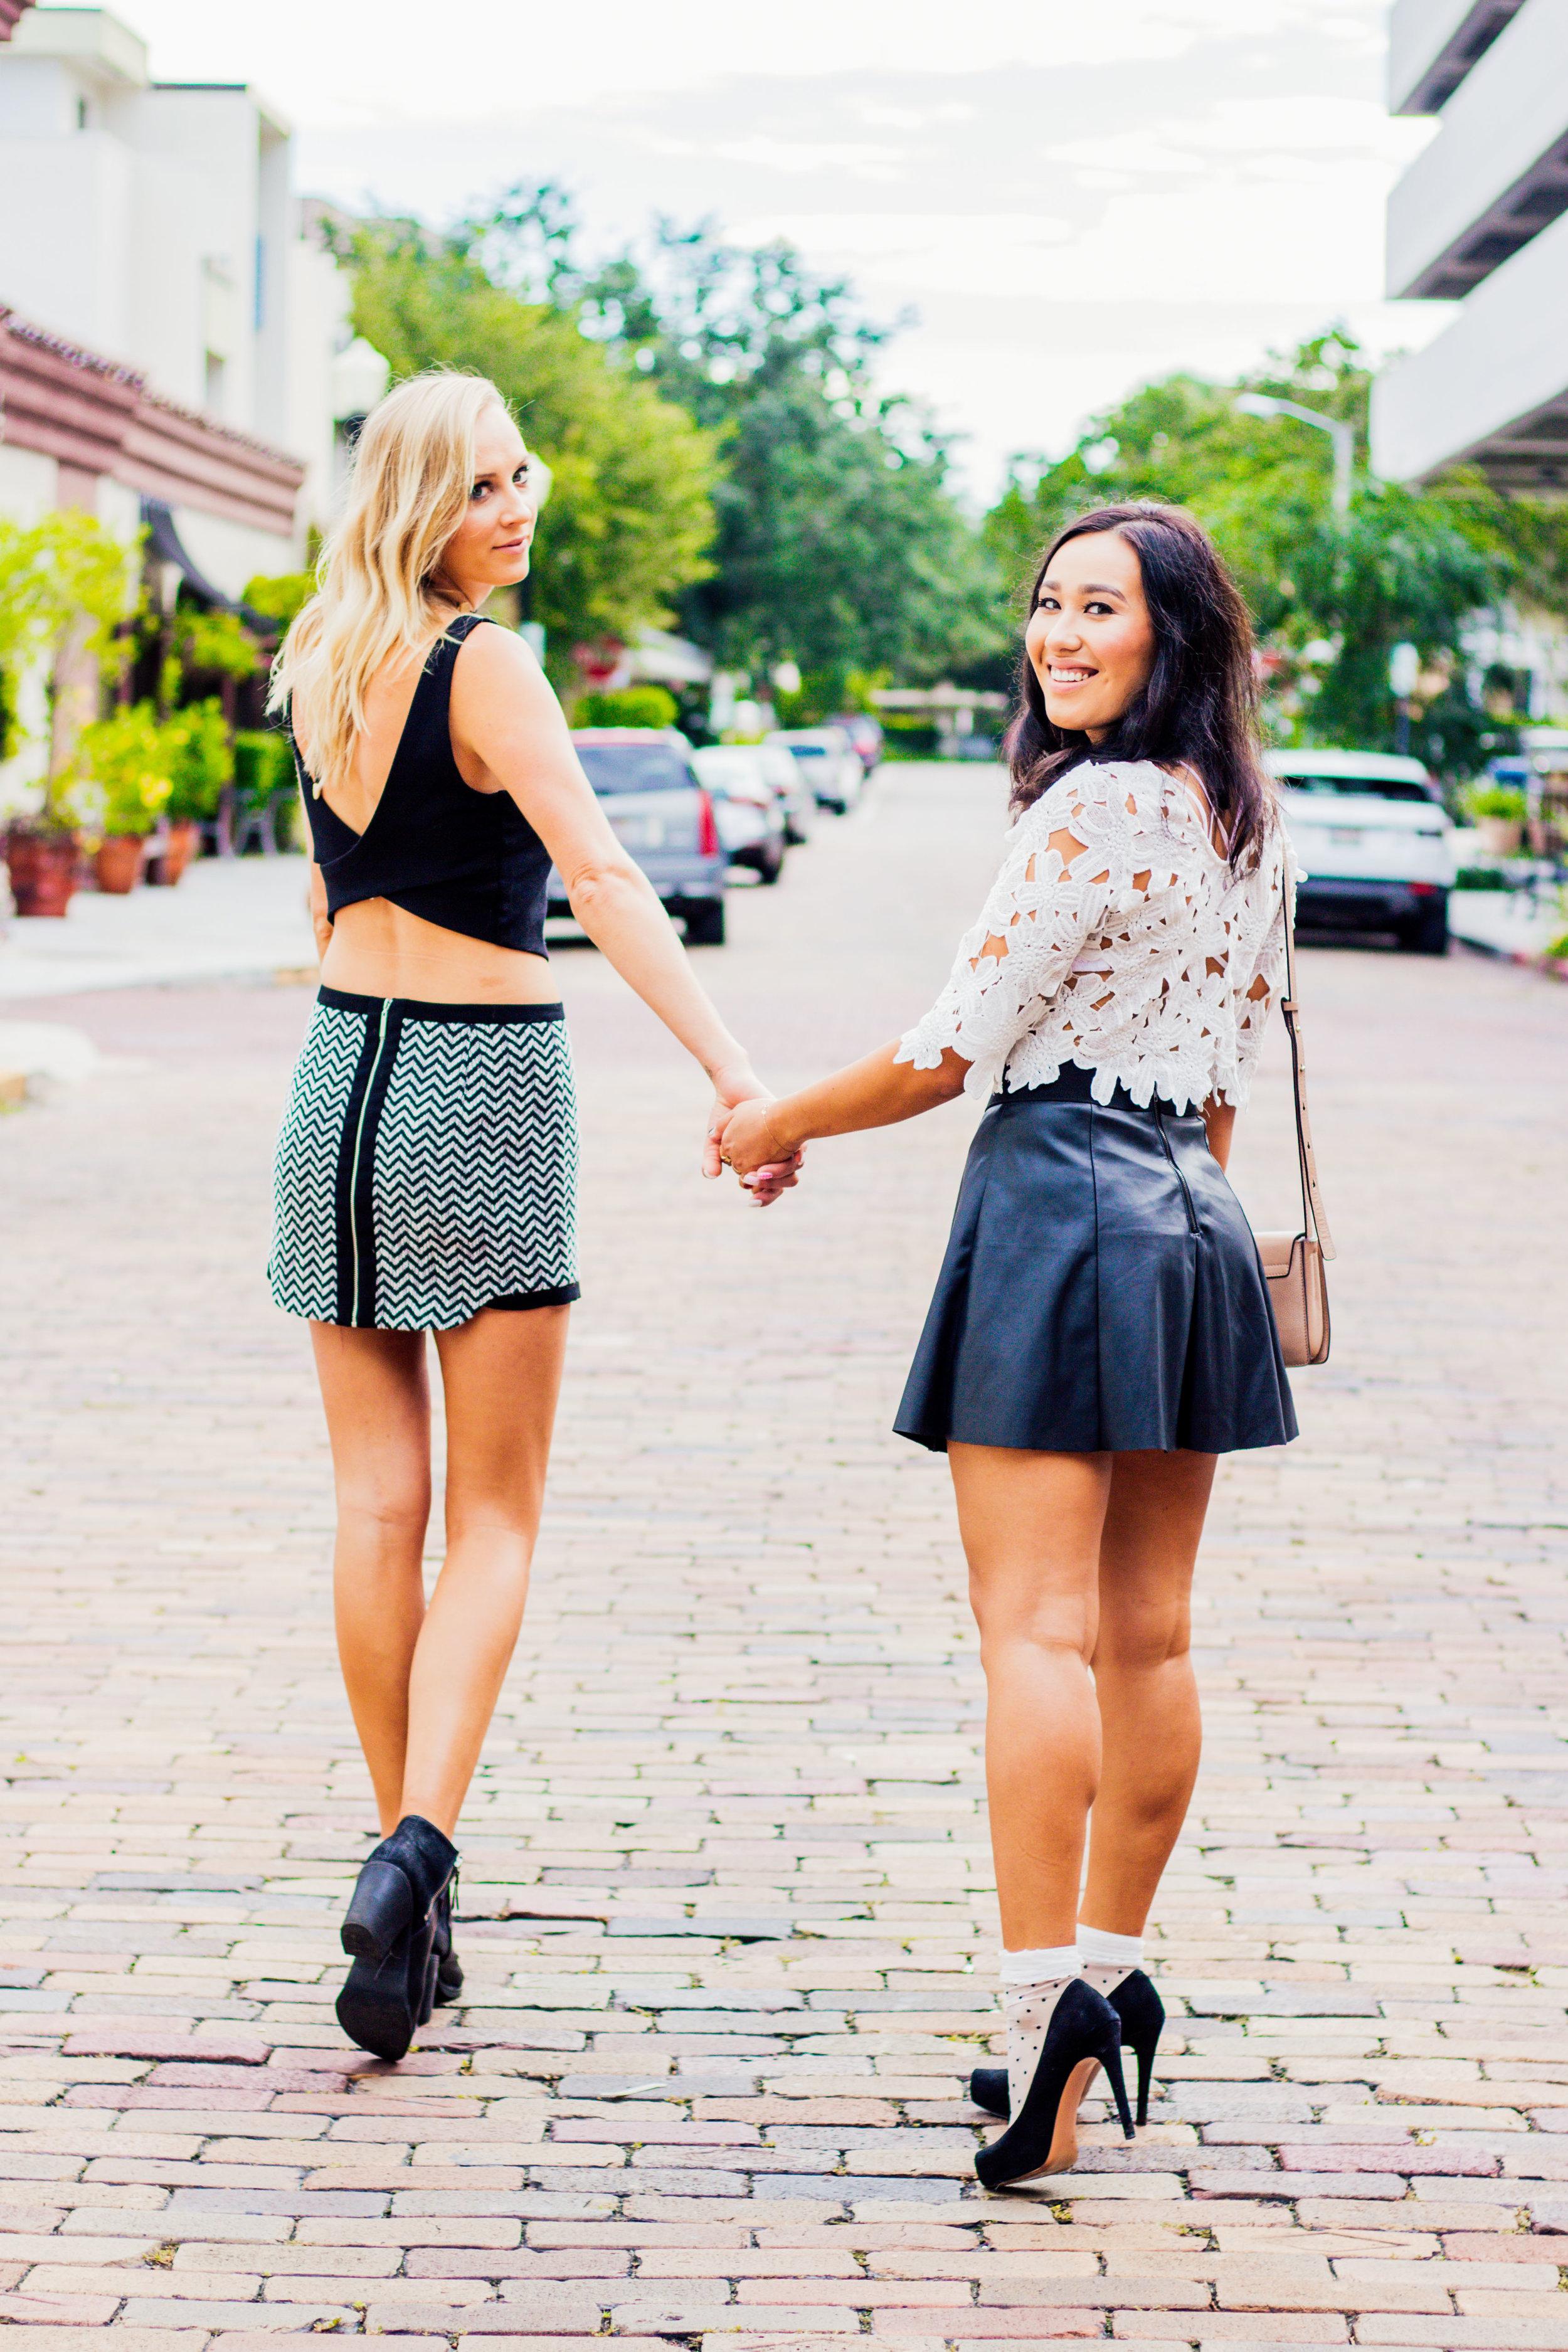 brunette-blonde-gossip-girl